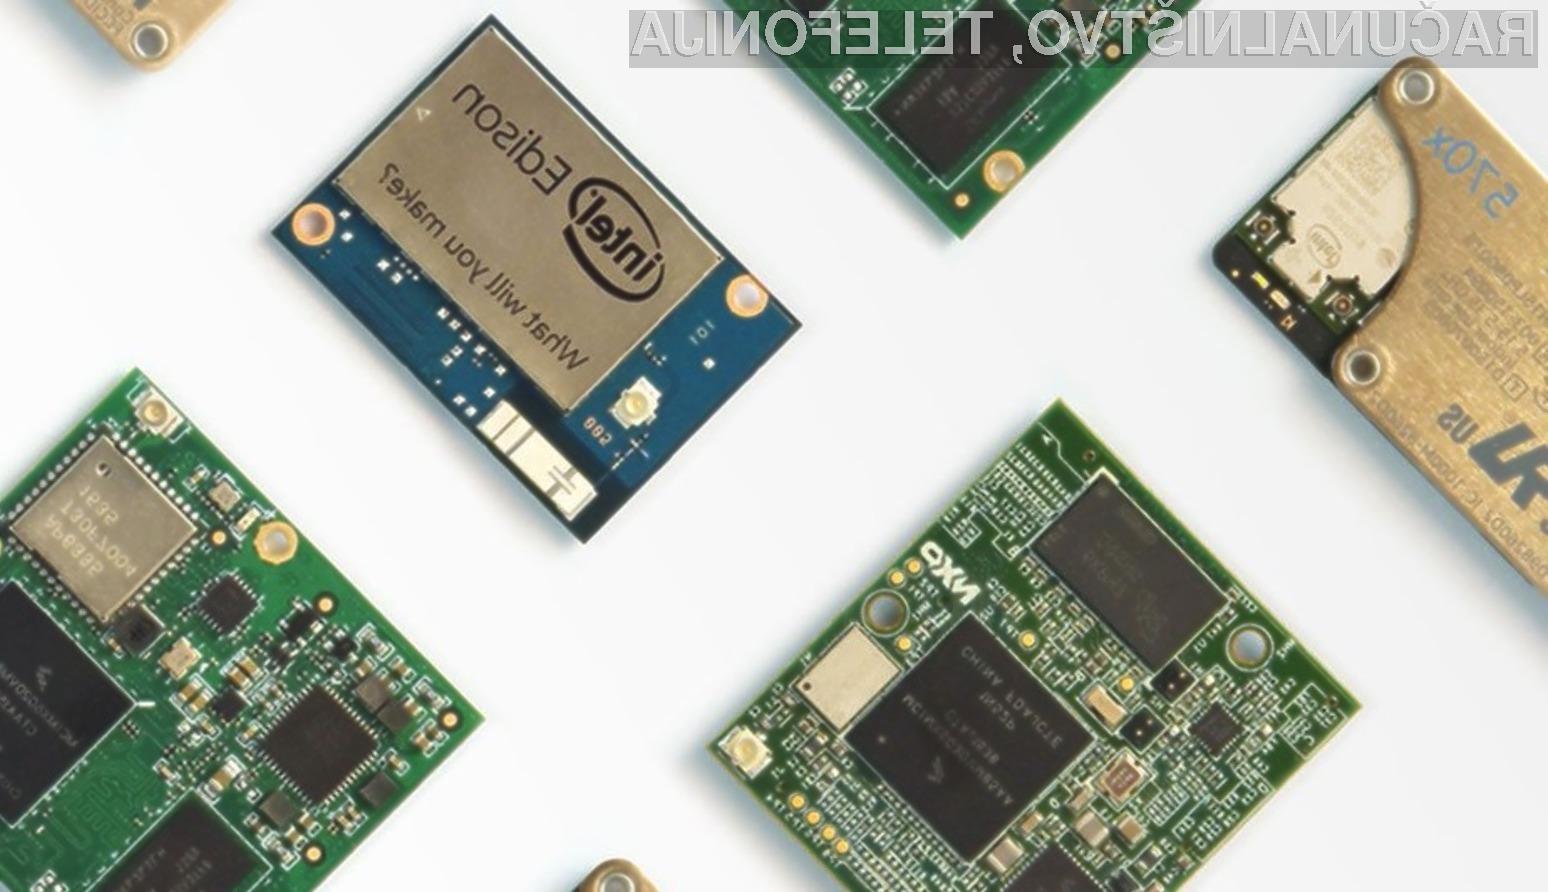 Platforma Google Android Things je pisana na kožo napravam internet stvari.